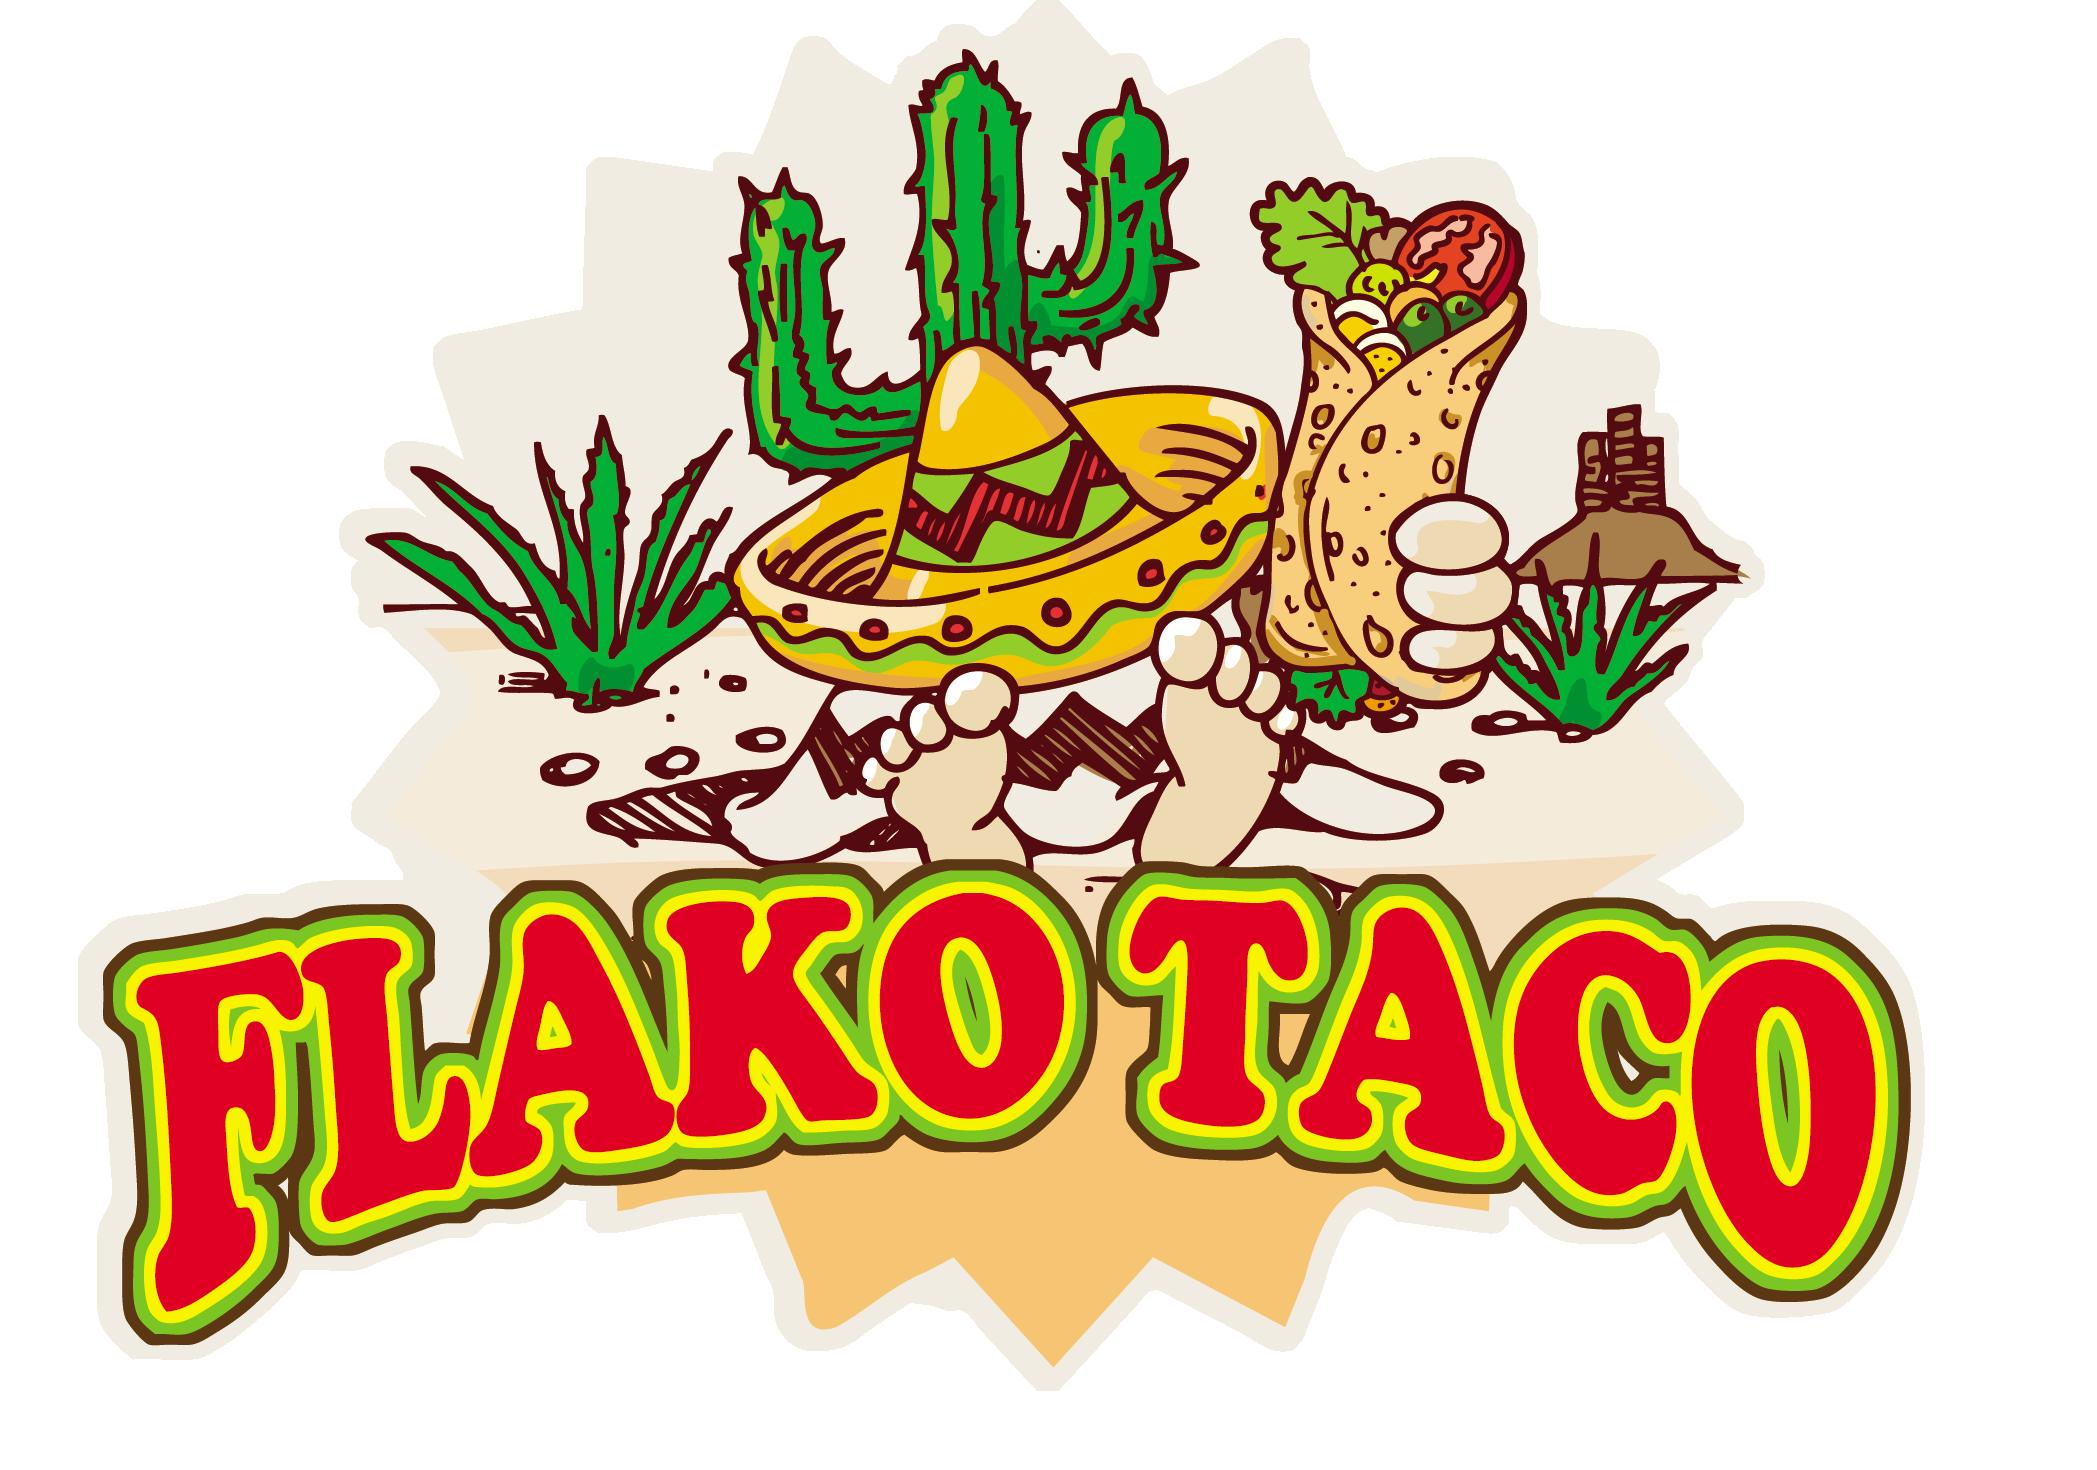 flako taco logo